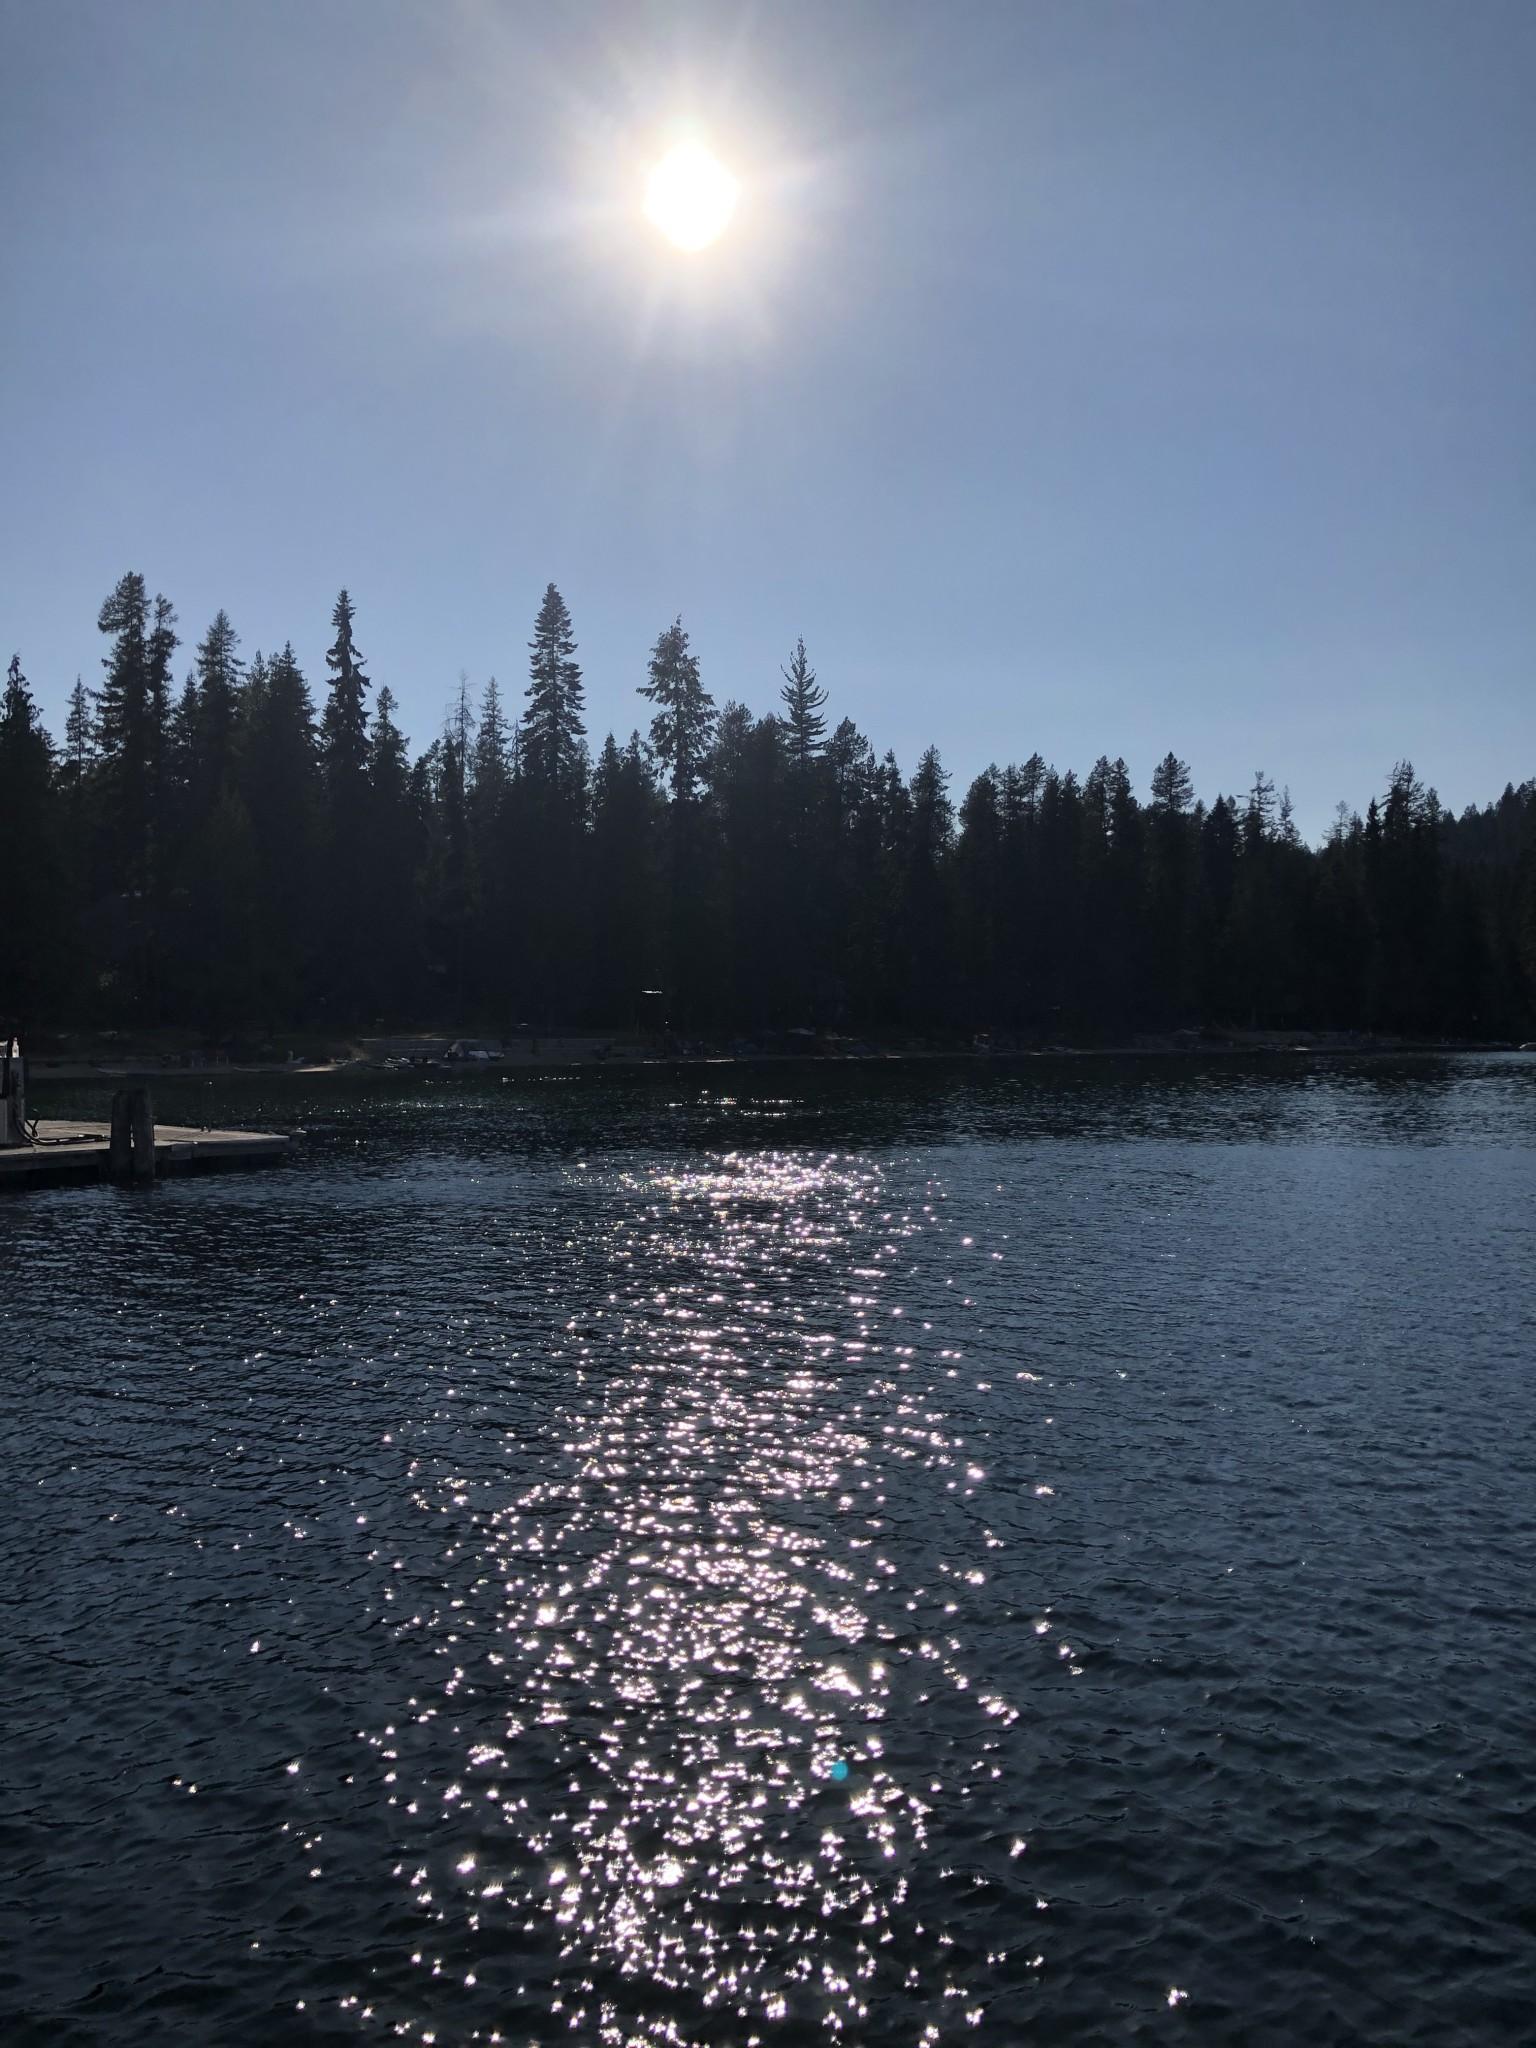 Luby Bay, Priest Lake (Ben Stein) spectator.org